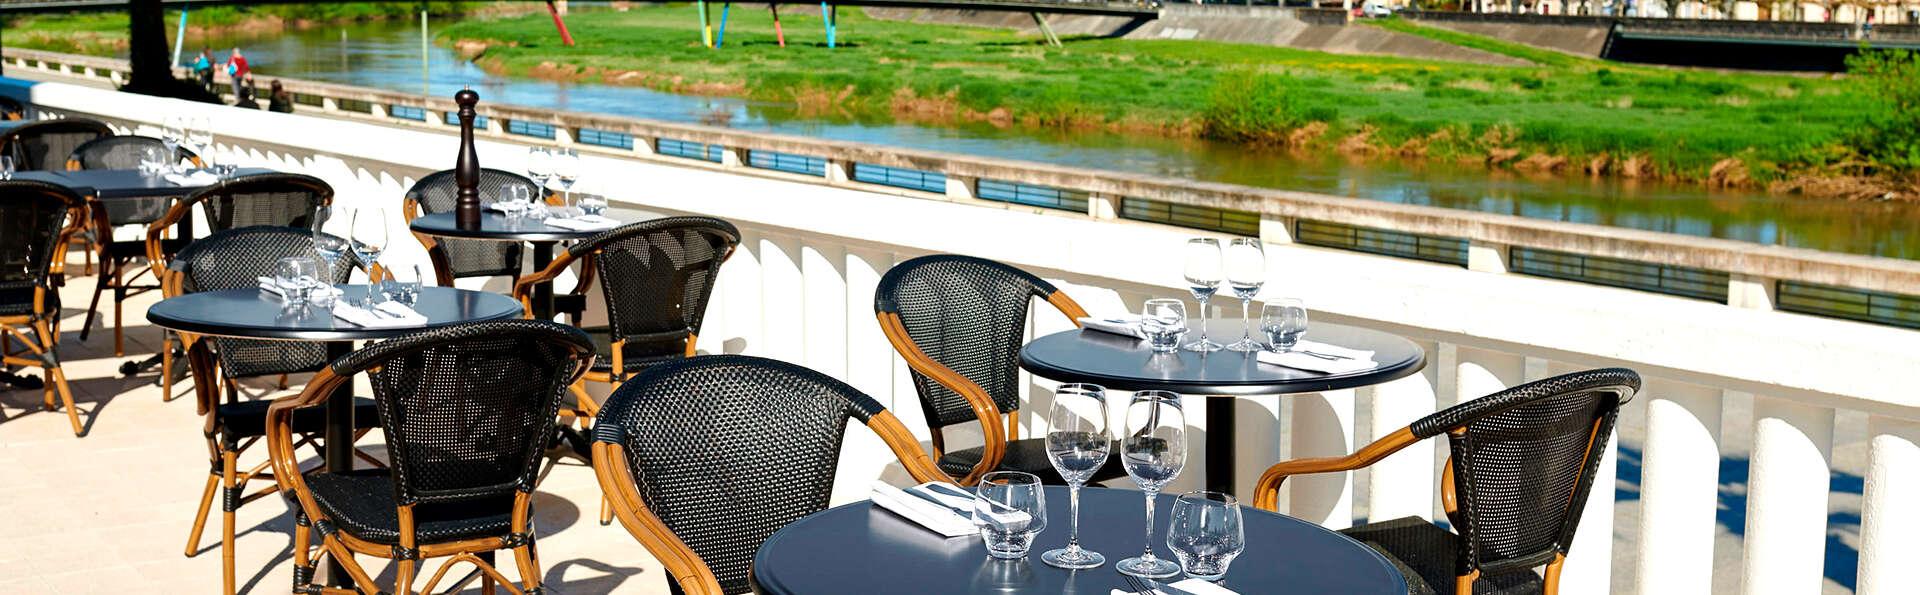 Hotel & Spa Vacances Bleues Le Splendid - EDIT_N2_TERRACE.jpg